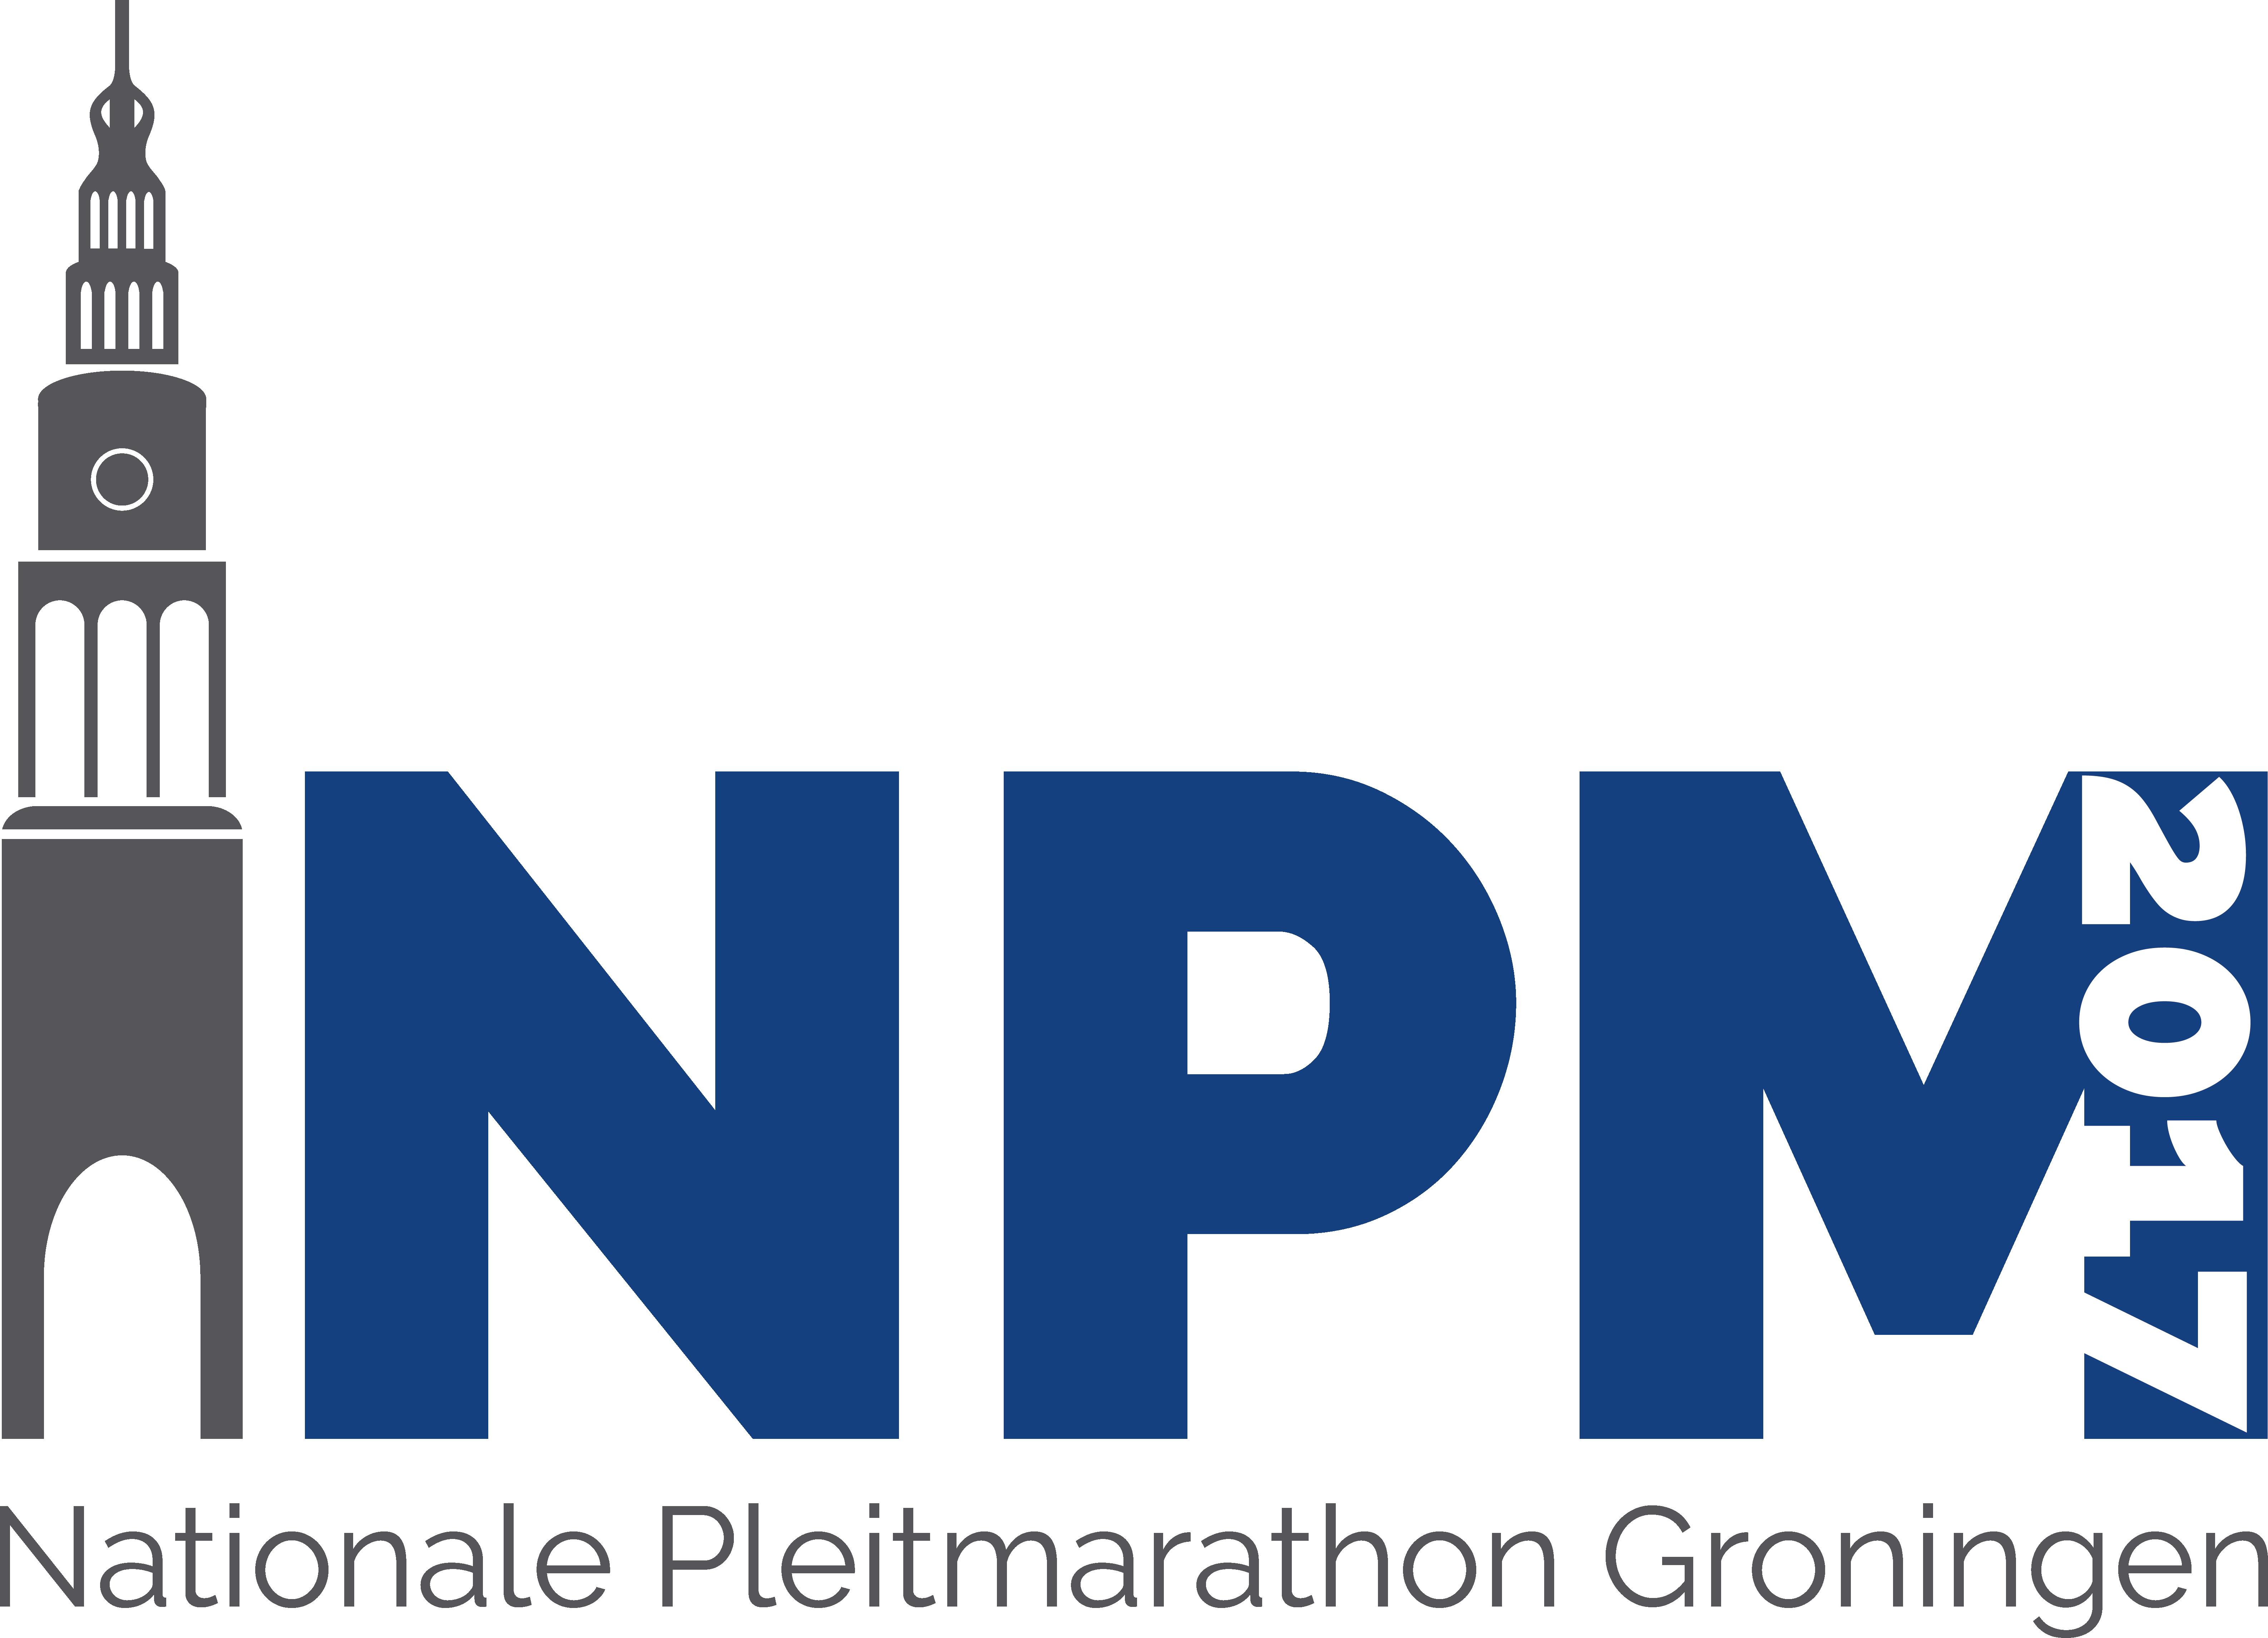 Pleitmarathon Groningen